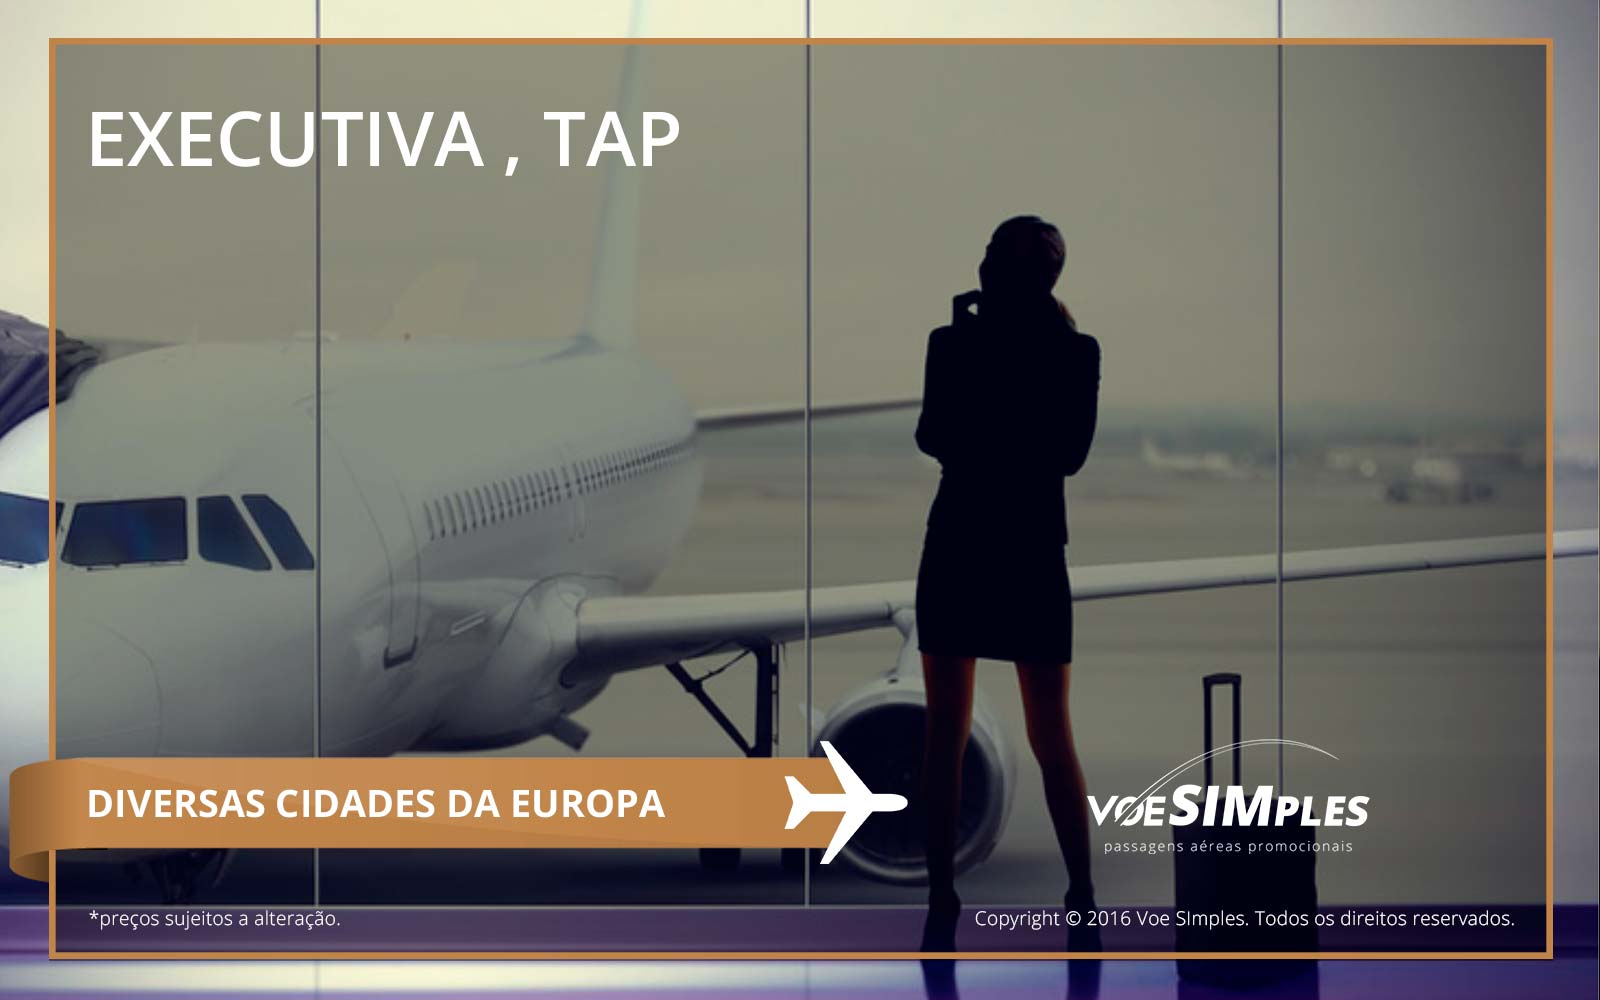 passagem-aerea-promocional-executiva-multi-destinos-europa-voe-simples-promocao-passagens-aereas-executivas-destinos-passagem-aerea-promo-executiva-multi@2x